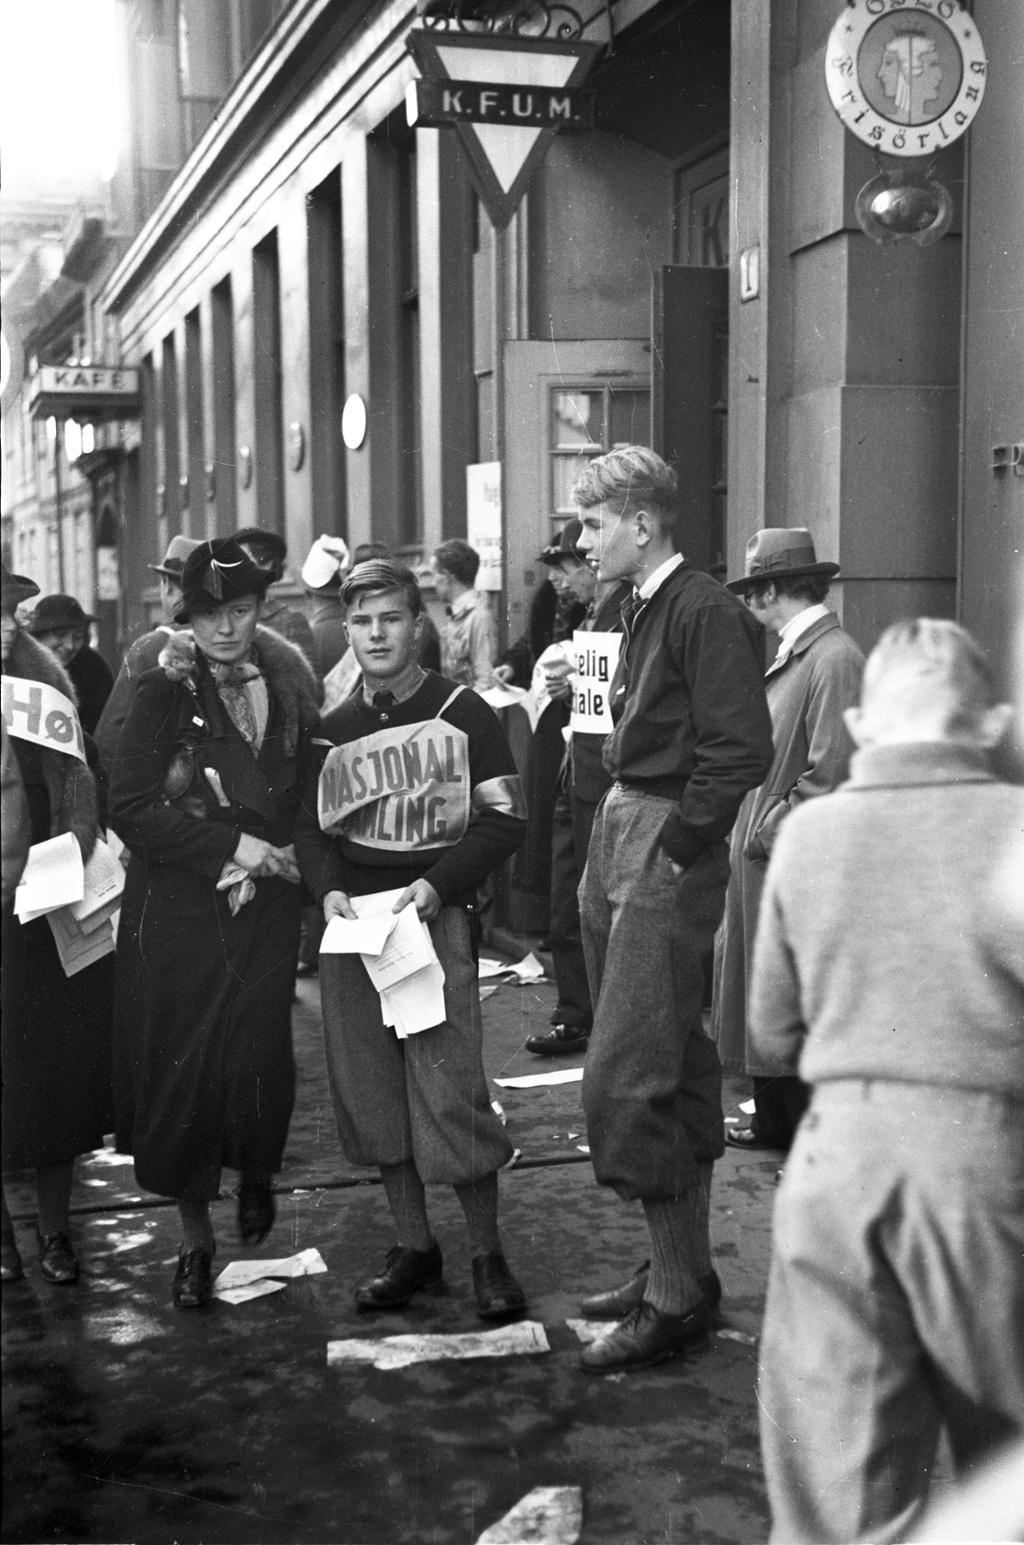 Valgtorg med en ung gutt med NS-banner. Foto.